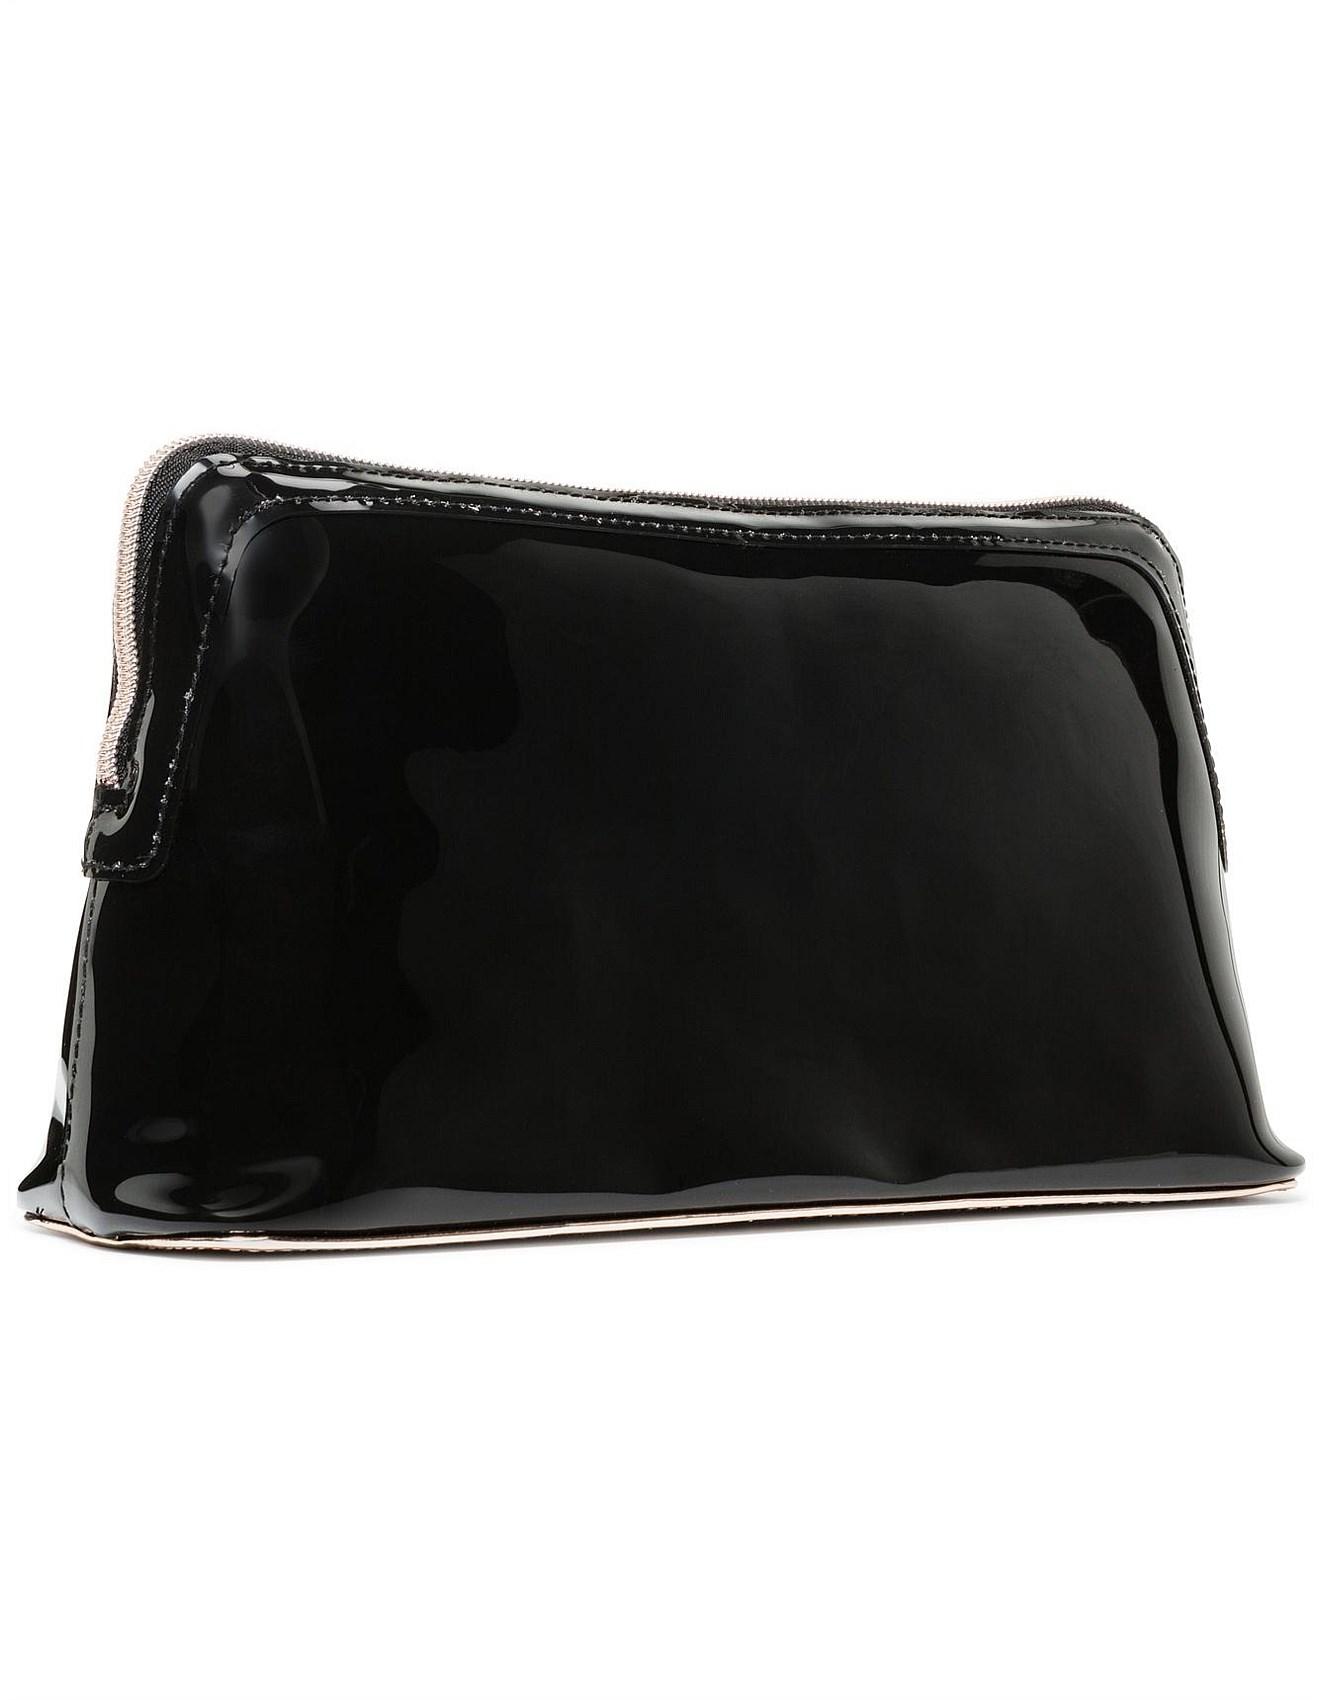 toiletry bags buy cosmetic makeup bags online david jones bow washbag. Black Bedroom Furniture Sets. Home Design Ideas